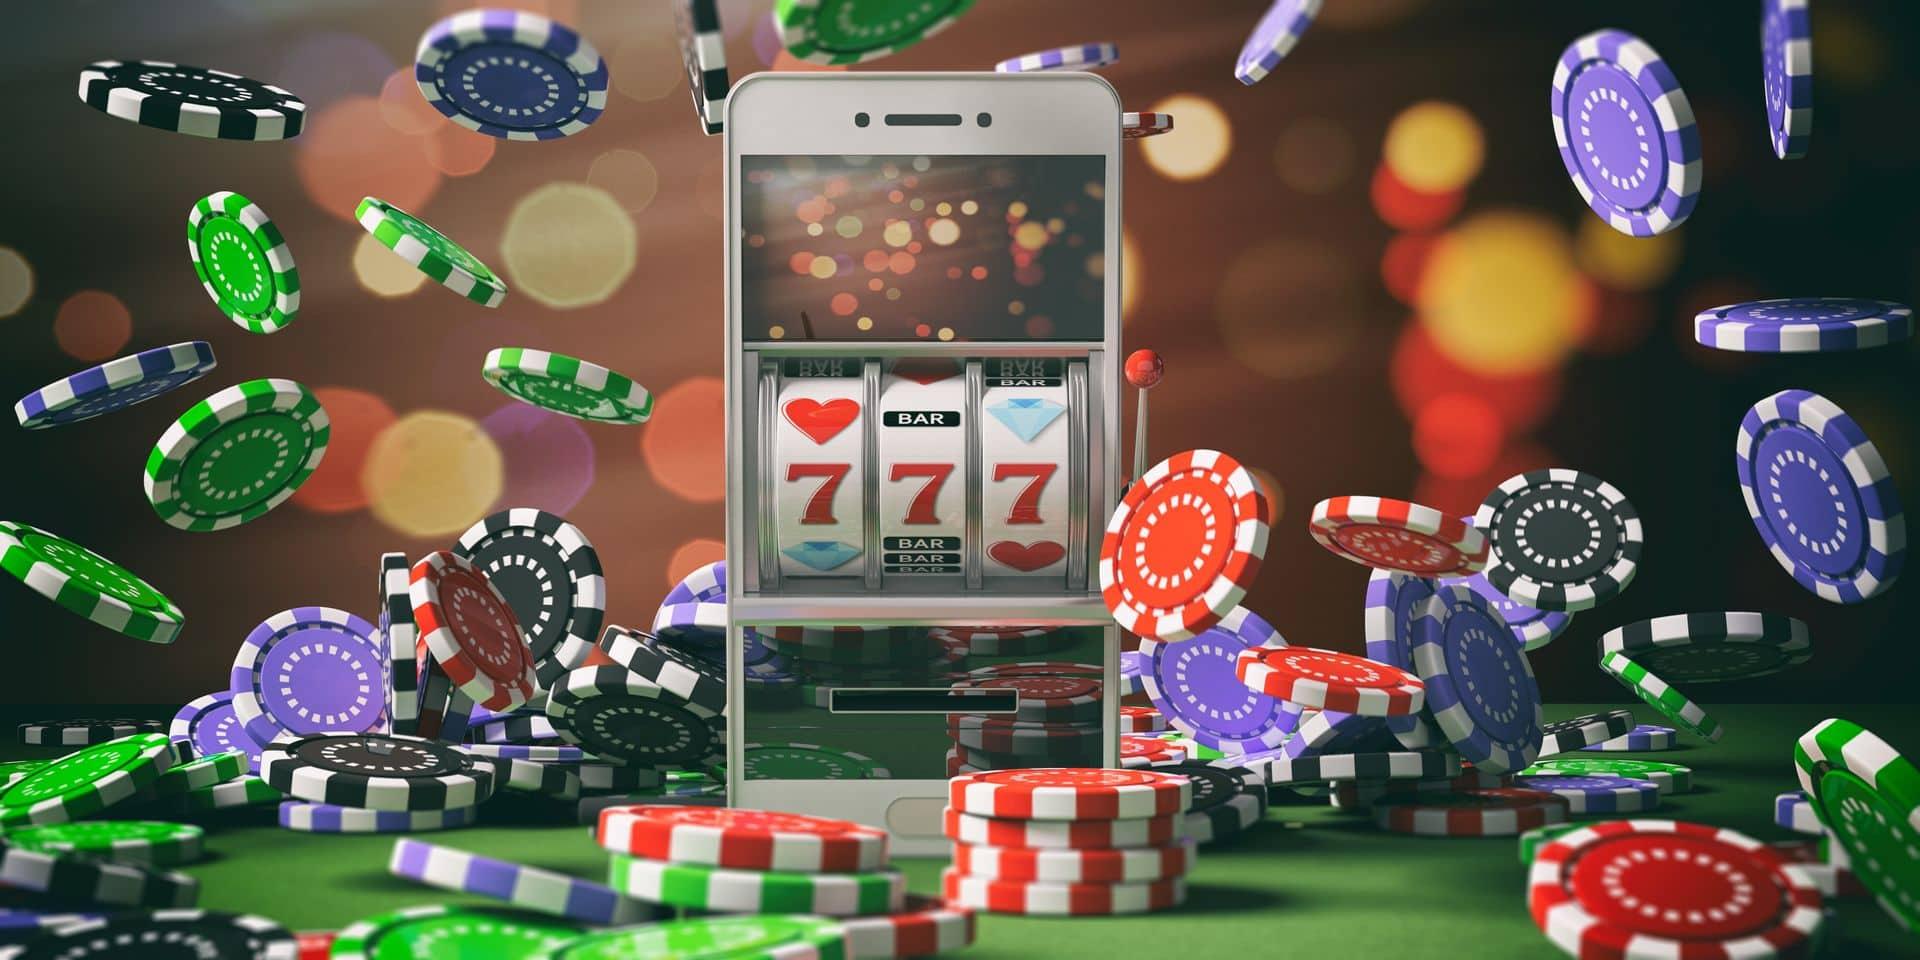 Online,Casino,Gambling,Concept.,Slot,Machine,On,A,Smartphone,Screen,